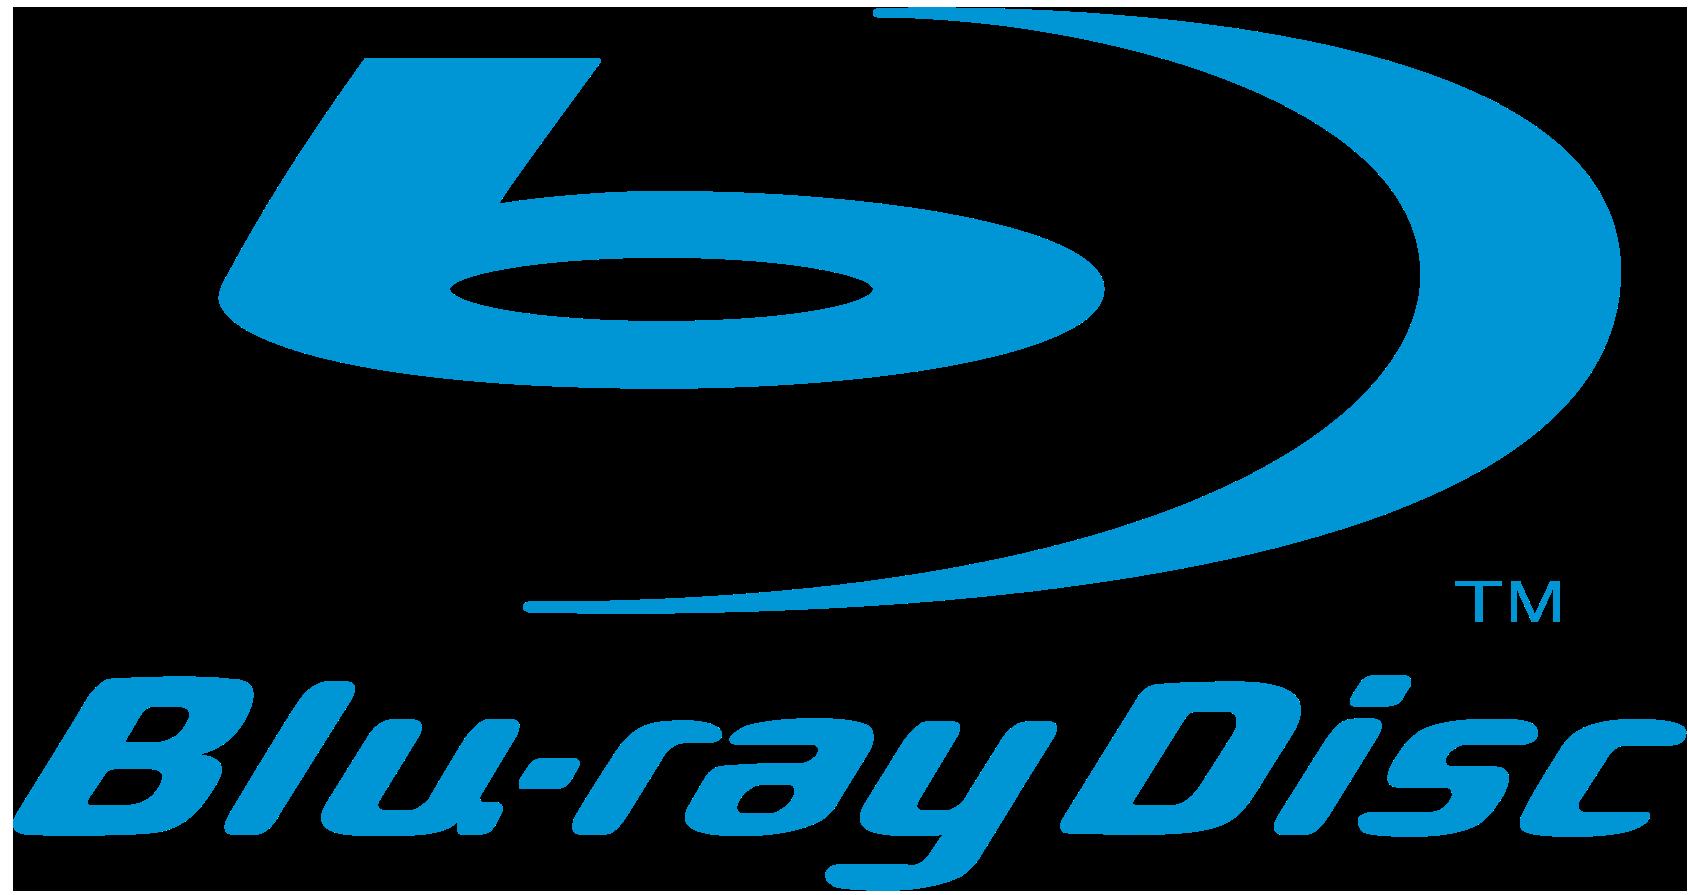 blu-ray-logo.png